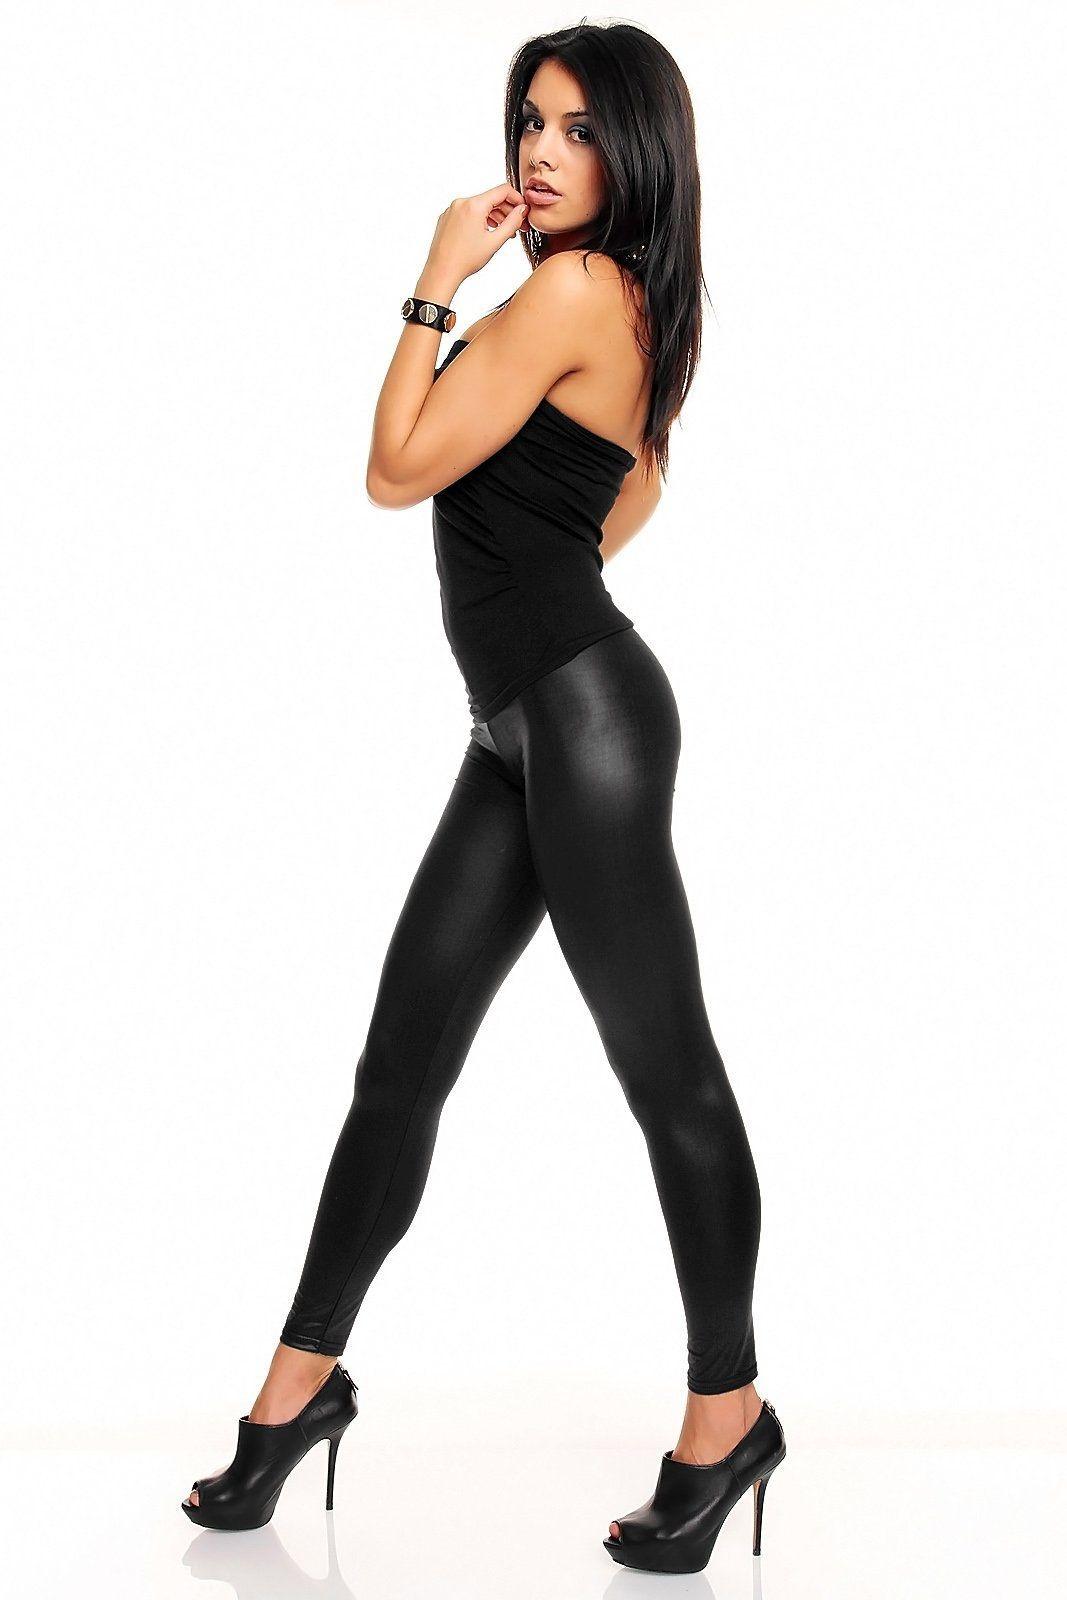 Hot Girls In Wet Look Leggings  Hot Girl Hd Wallpaper-8242